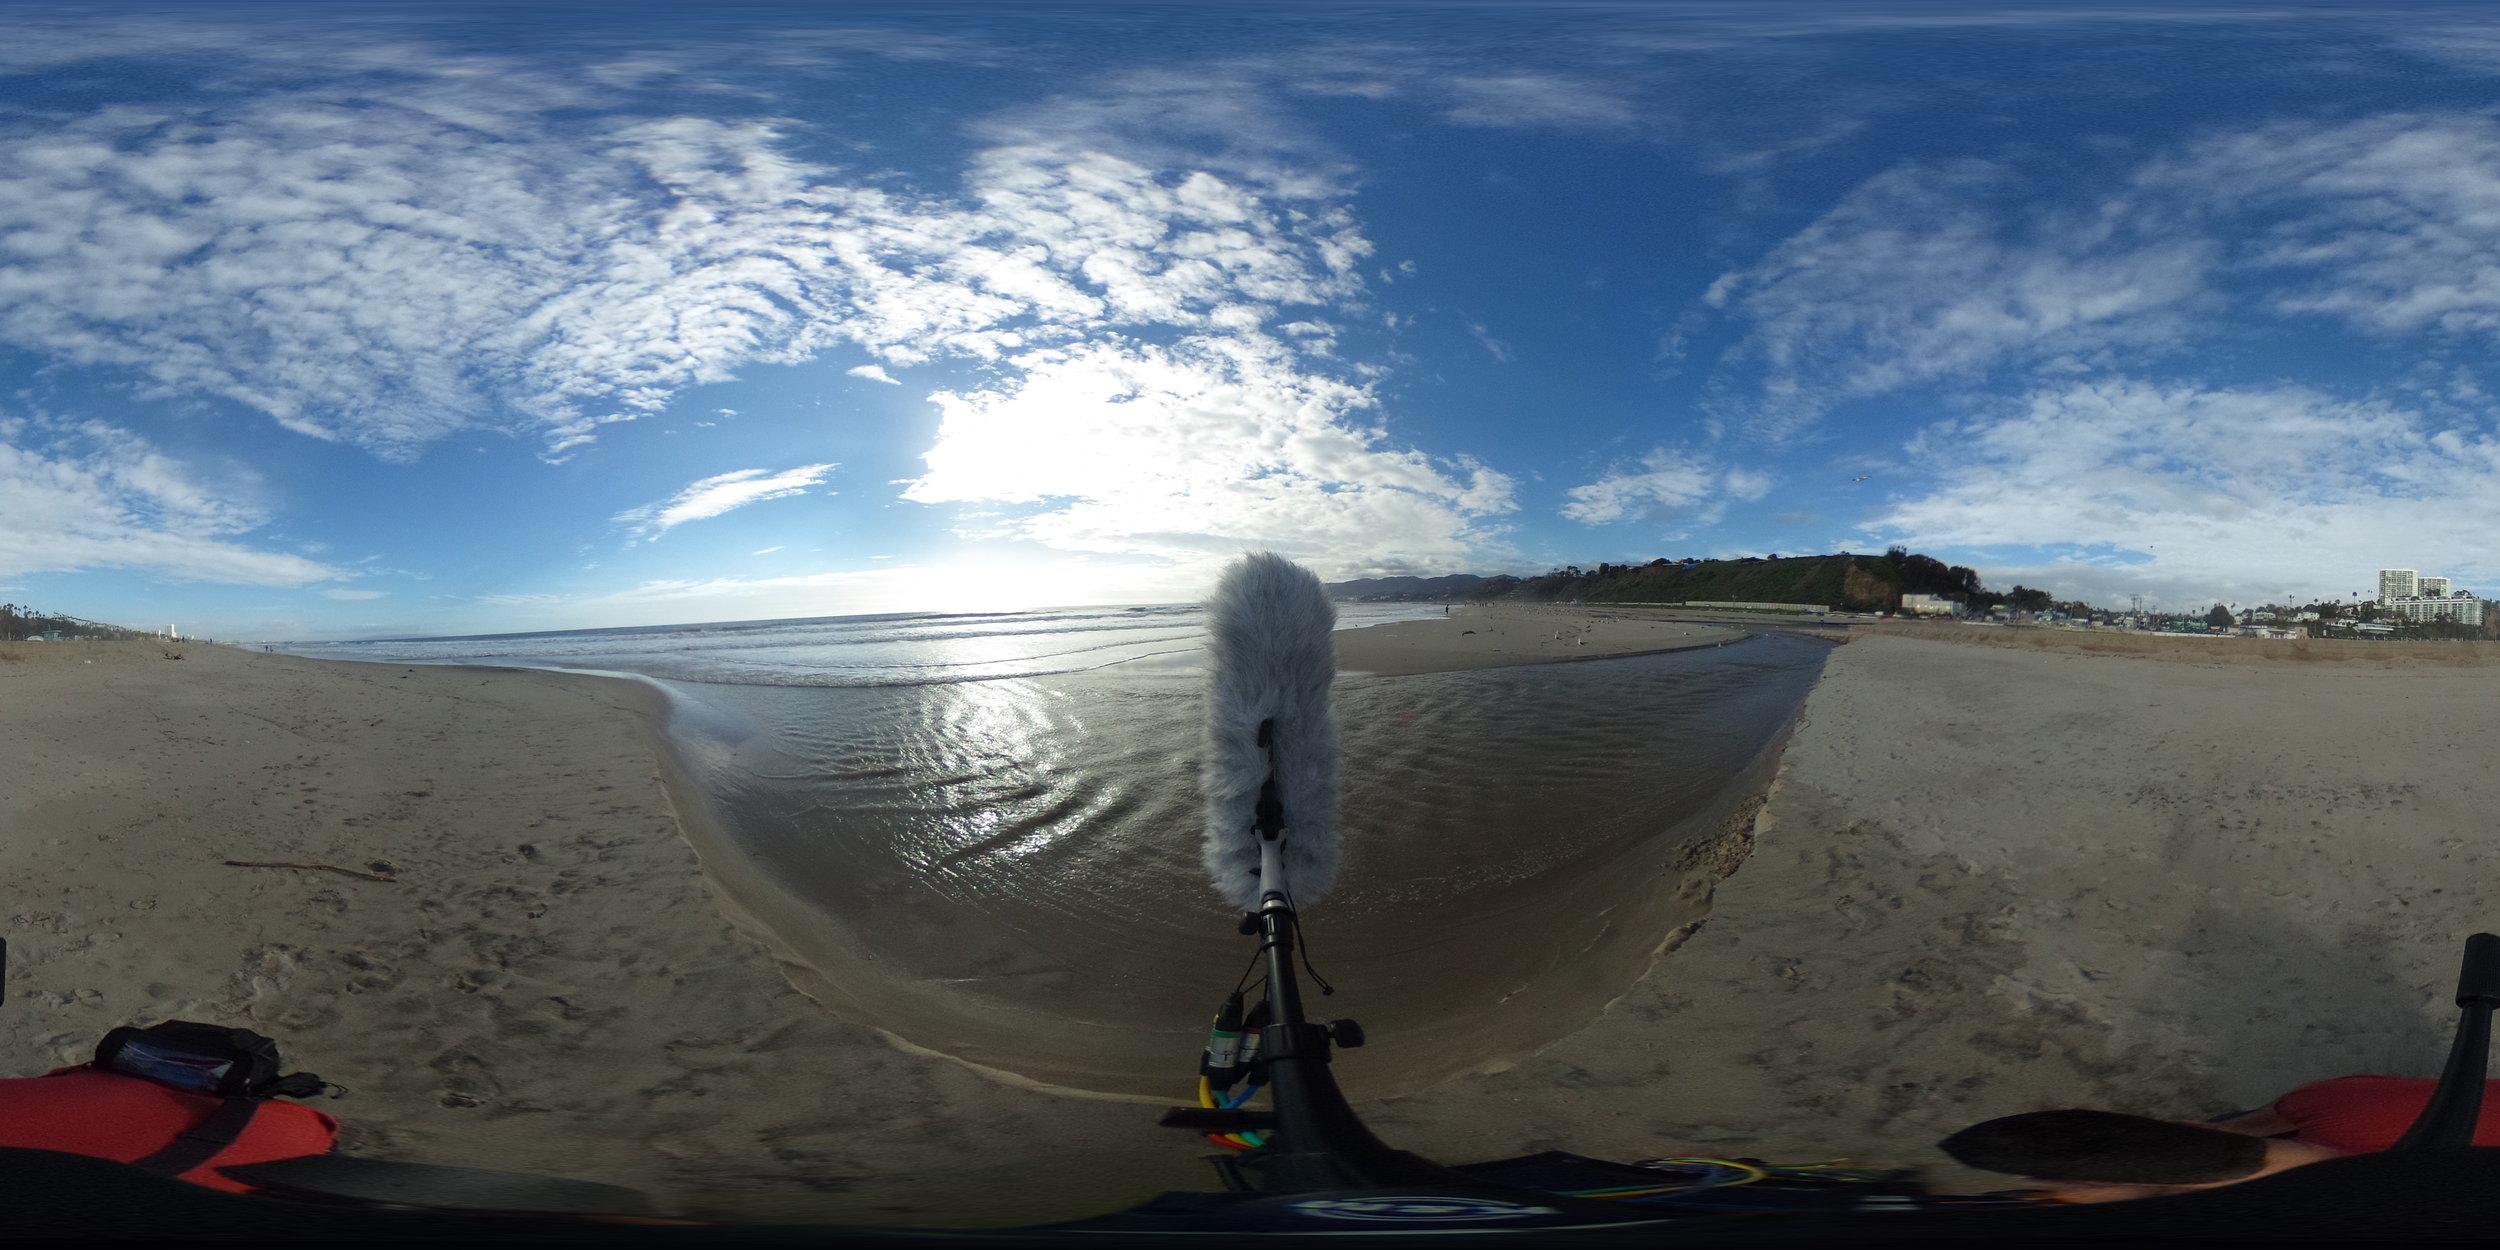 EXT_Day_Beach_OceanWaves_MediumCloseDistance_Footsteps_NearEstuary_JPEG.JPG